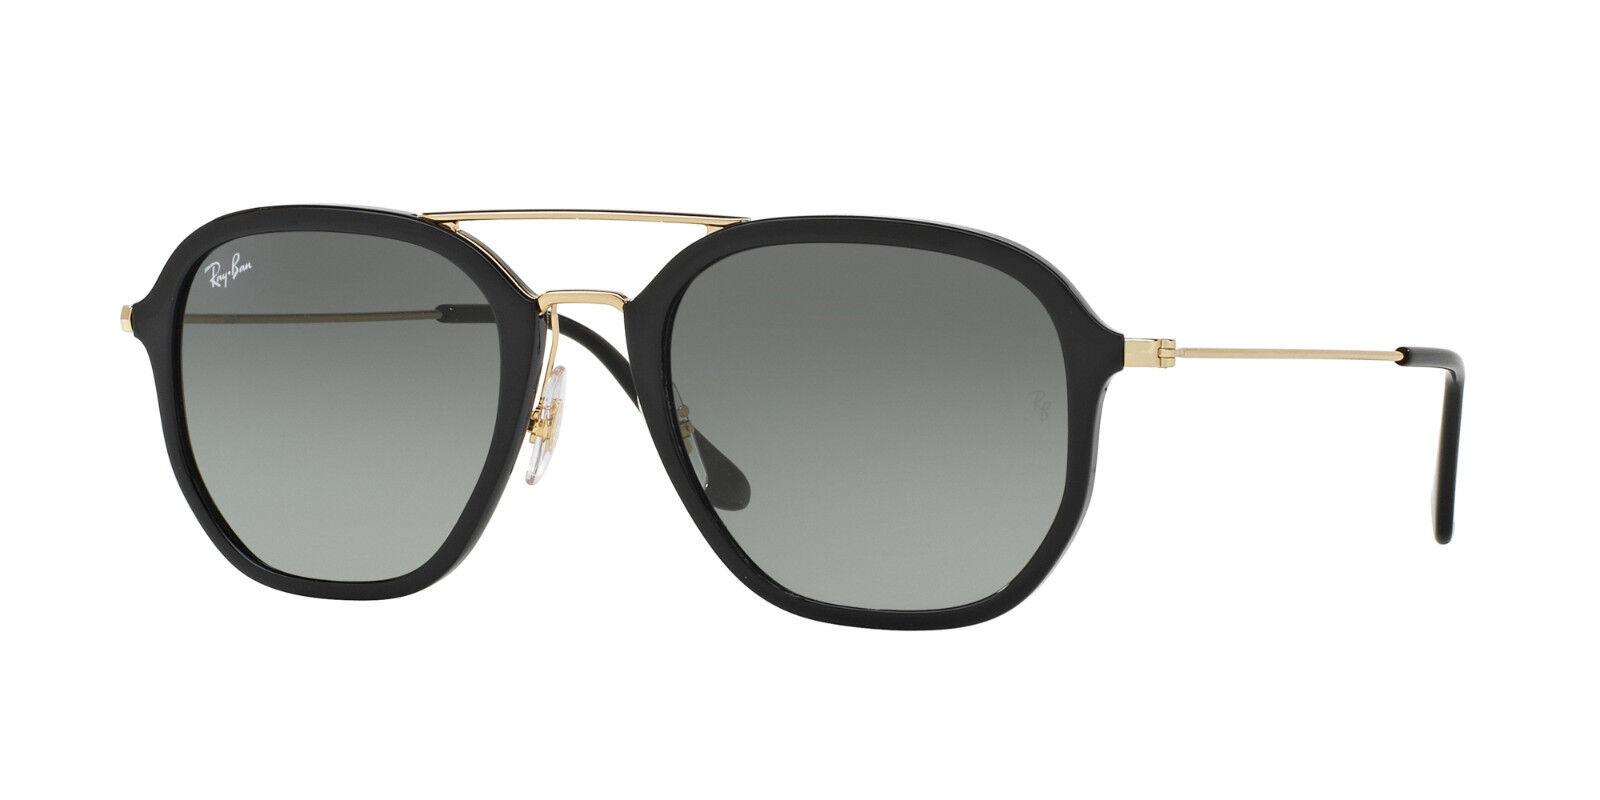 ce761e2c0c Sunglasses Ray-Ban Rb4273 601 71 52 Black Gradient Green for sale ...